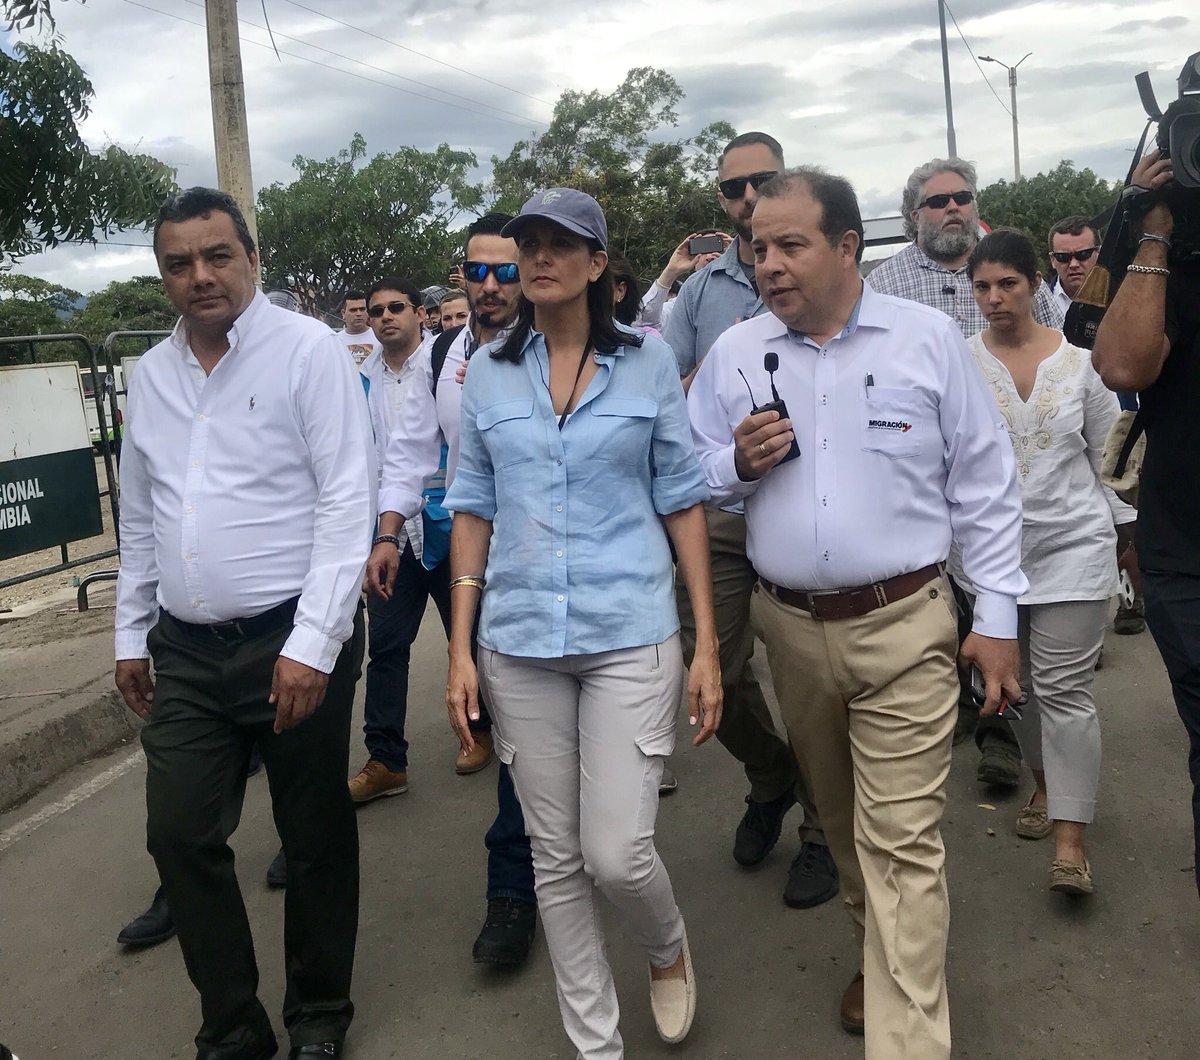 Venezuela-Colombia - Página 5 DkHUTD1XcAA7g5v